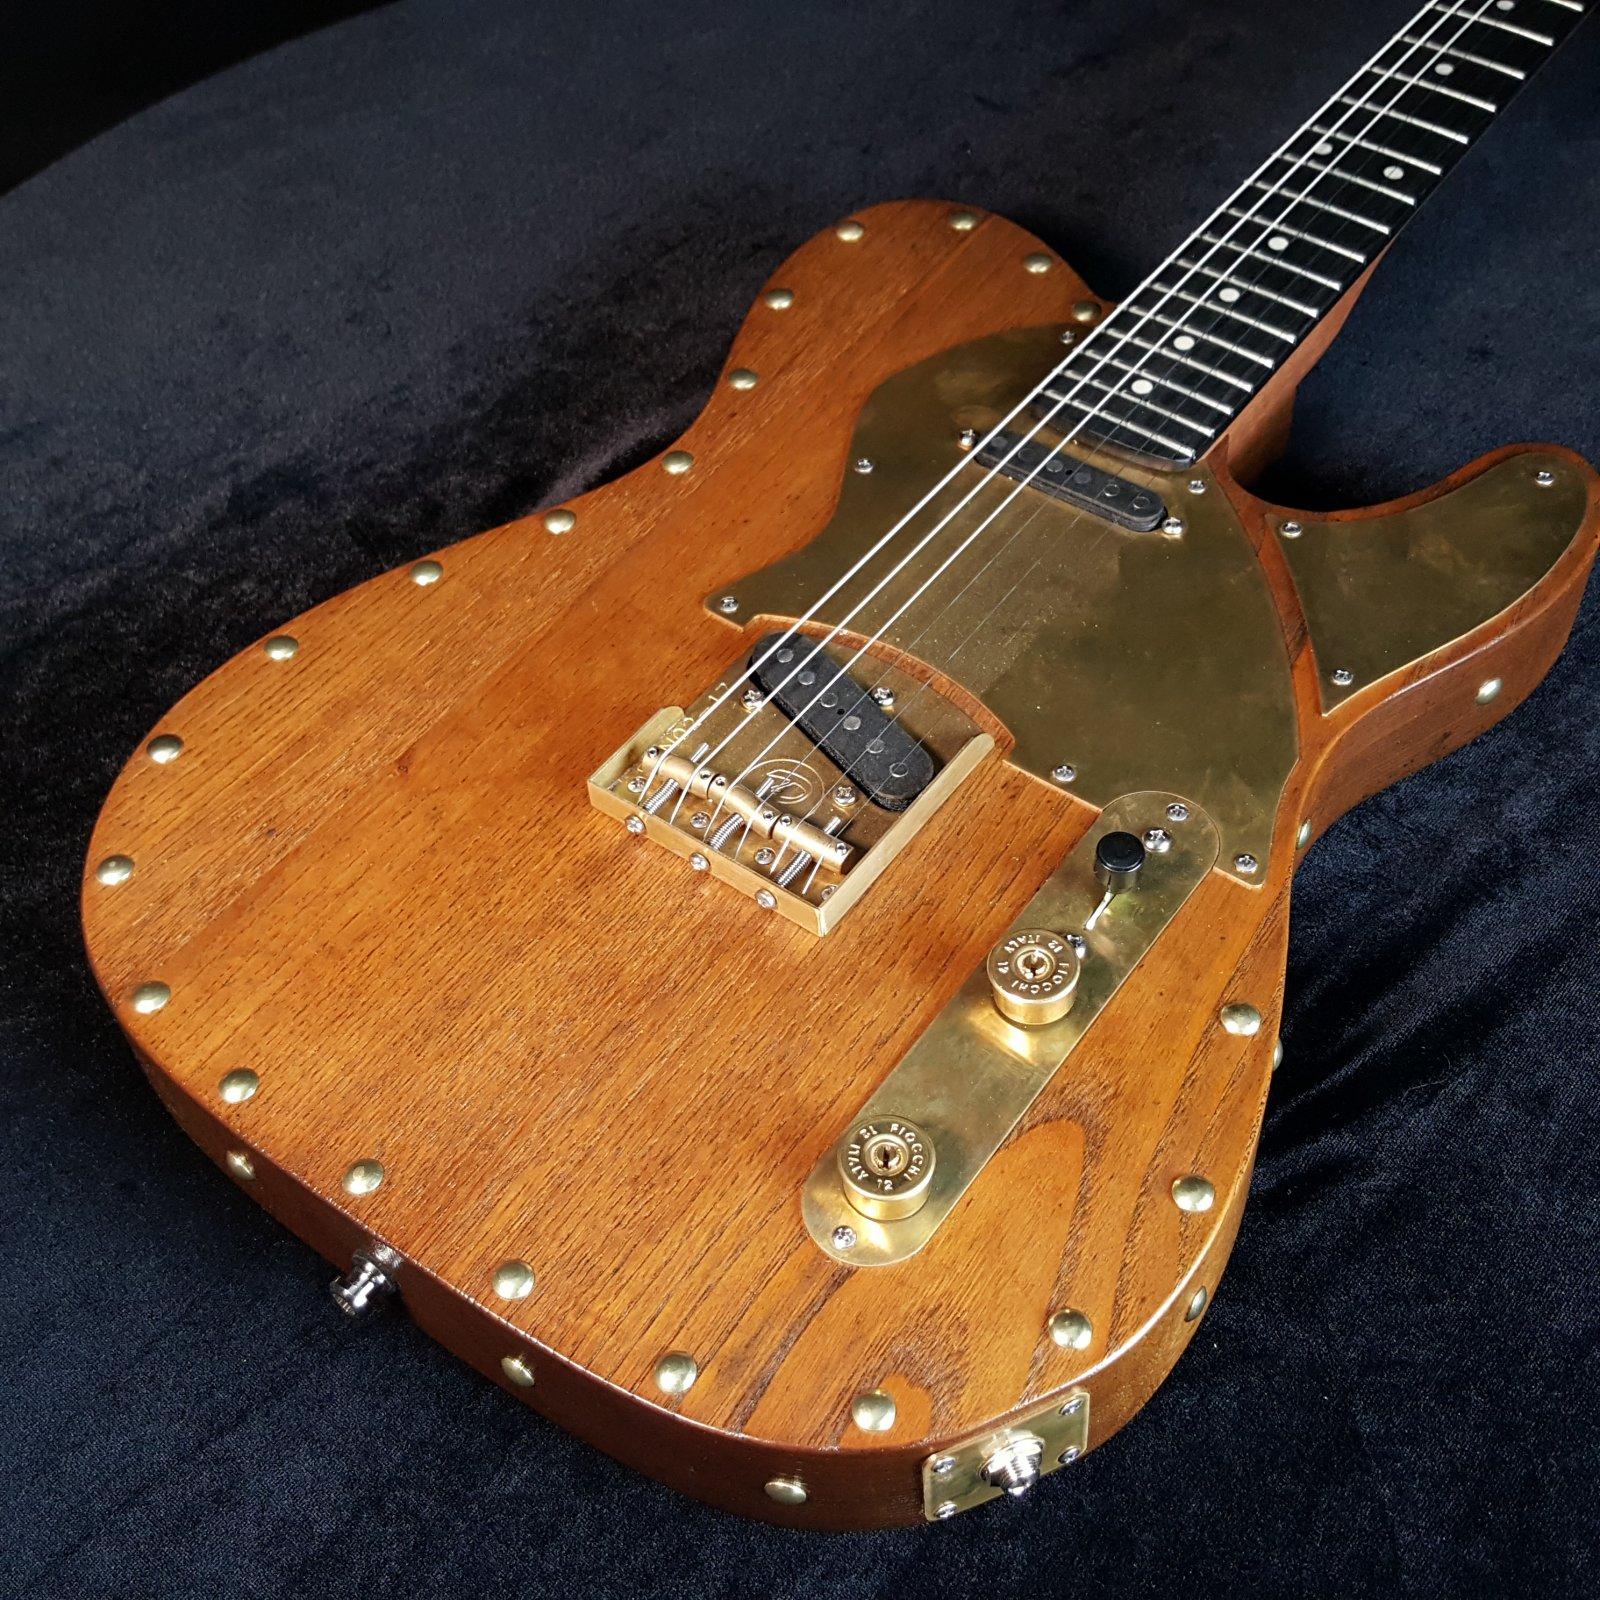 Paoletti Nancy Wine Series SS Electric Guitar w/ Case Display